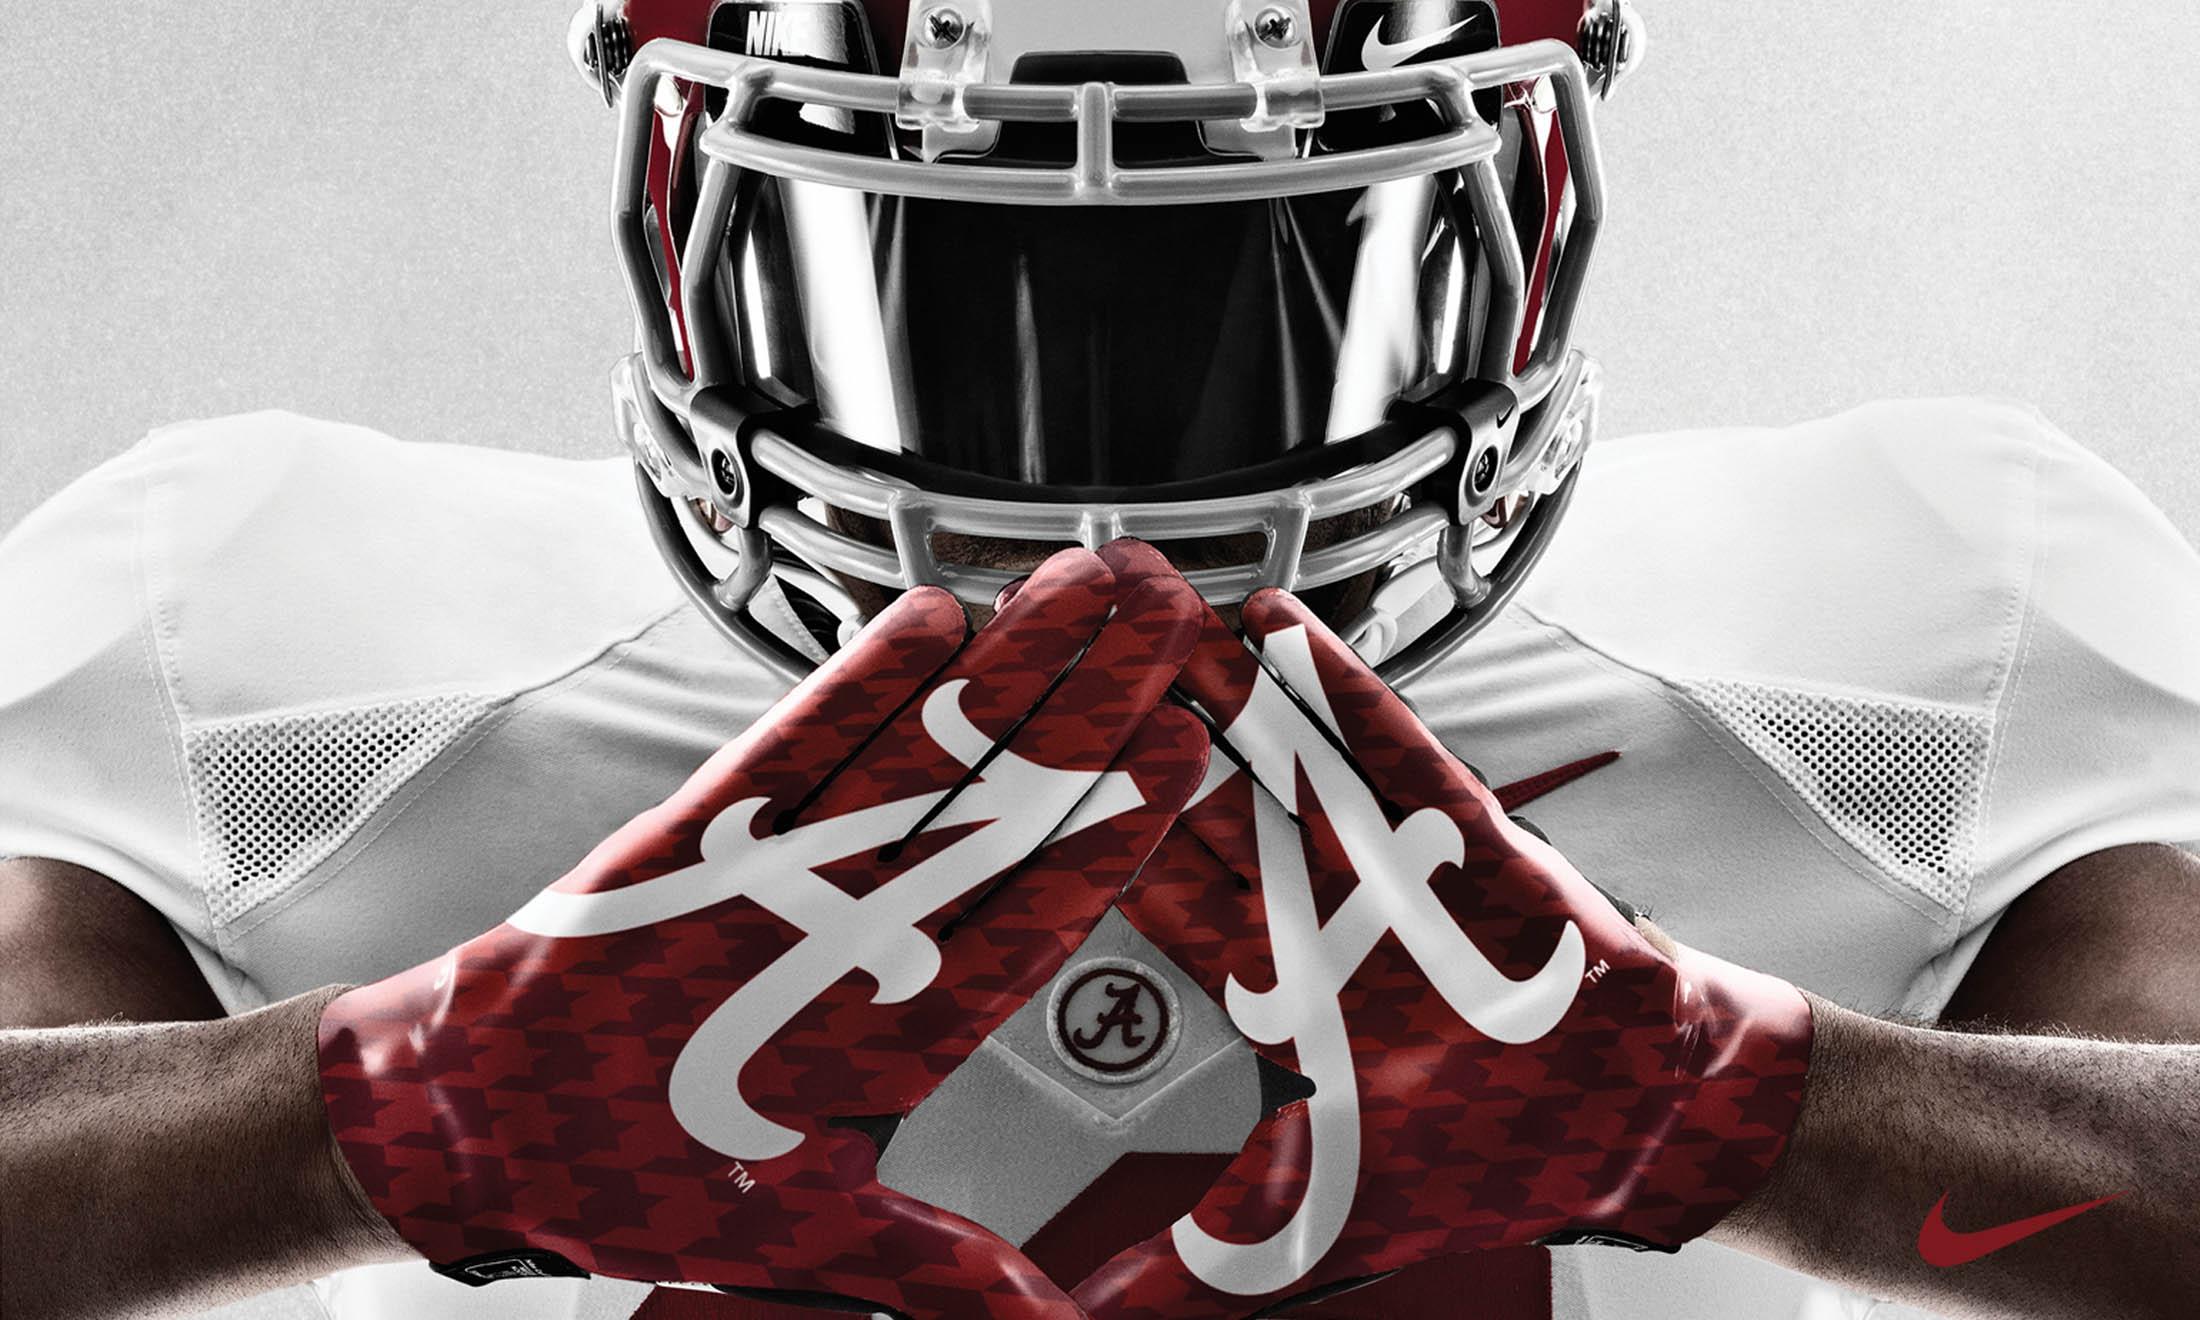 Alabama Crimson Tide Nike Wallpaper Alabama crimson tide nike football 2200x1320